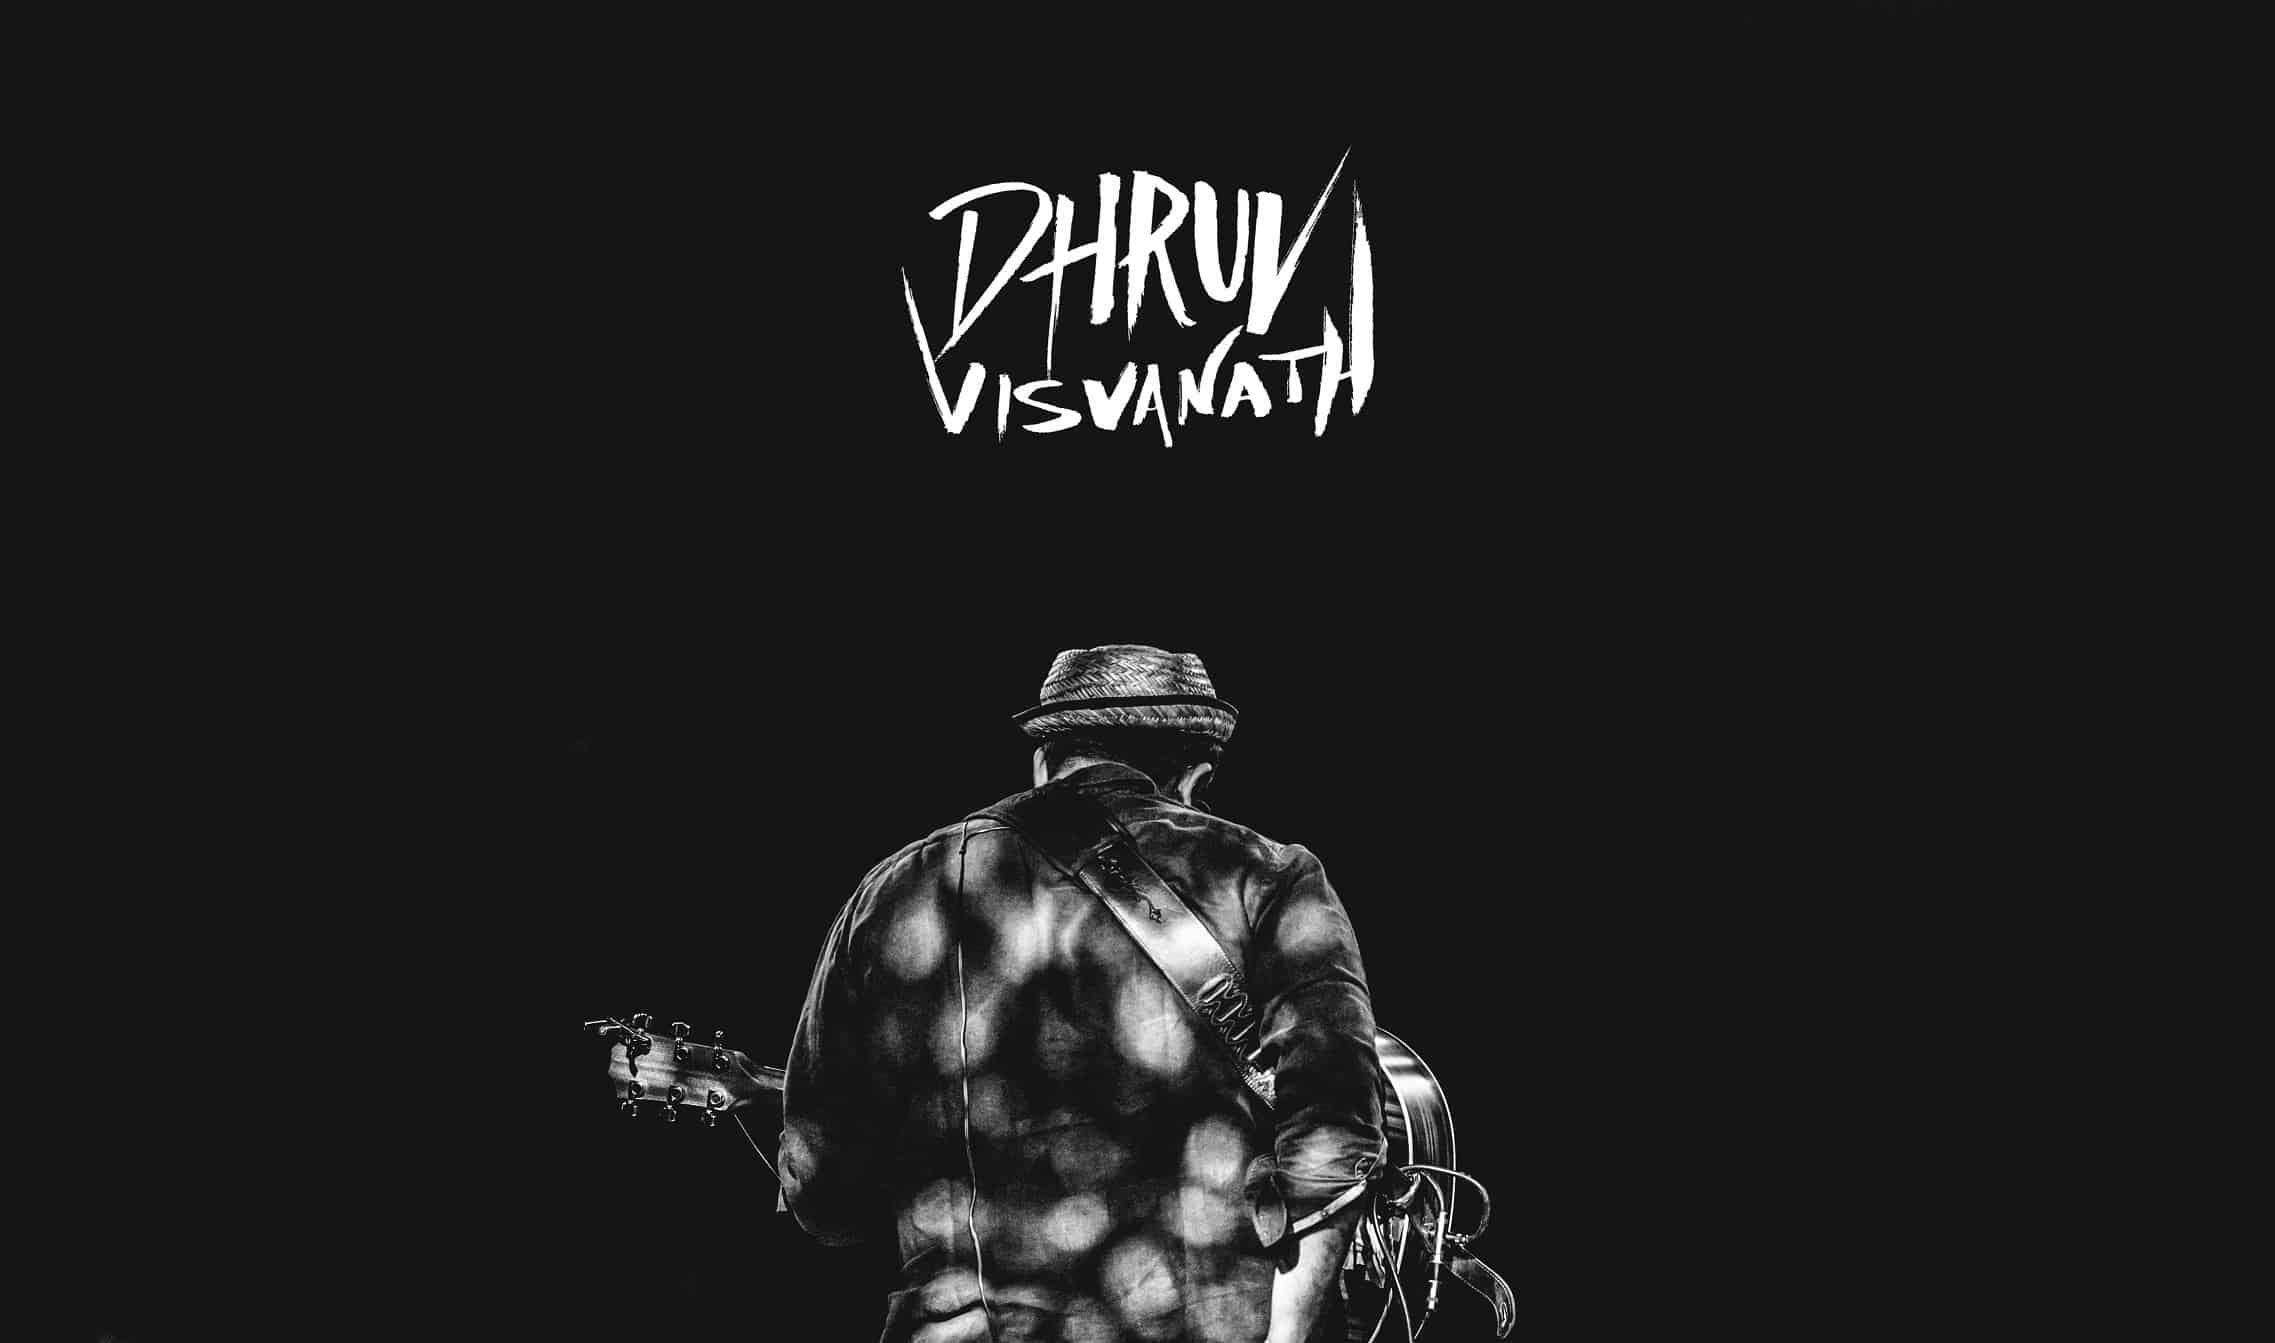 Dhruv Visvanath © 2018